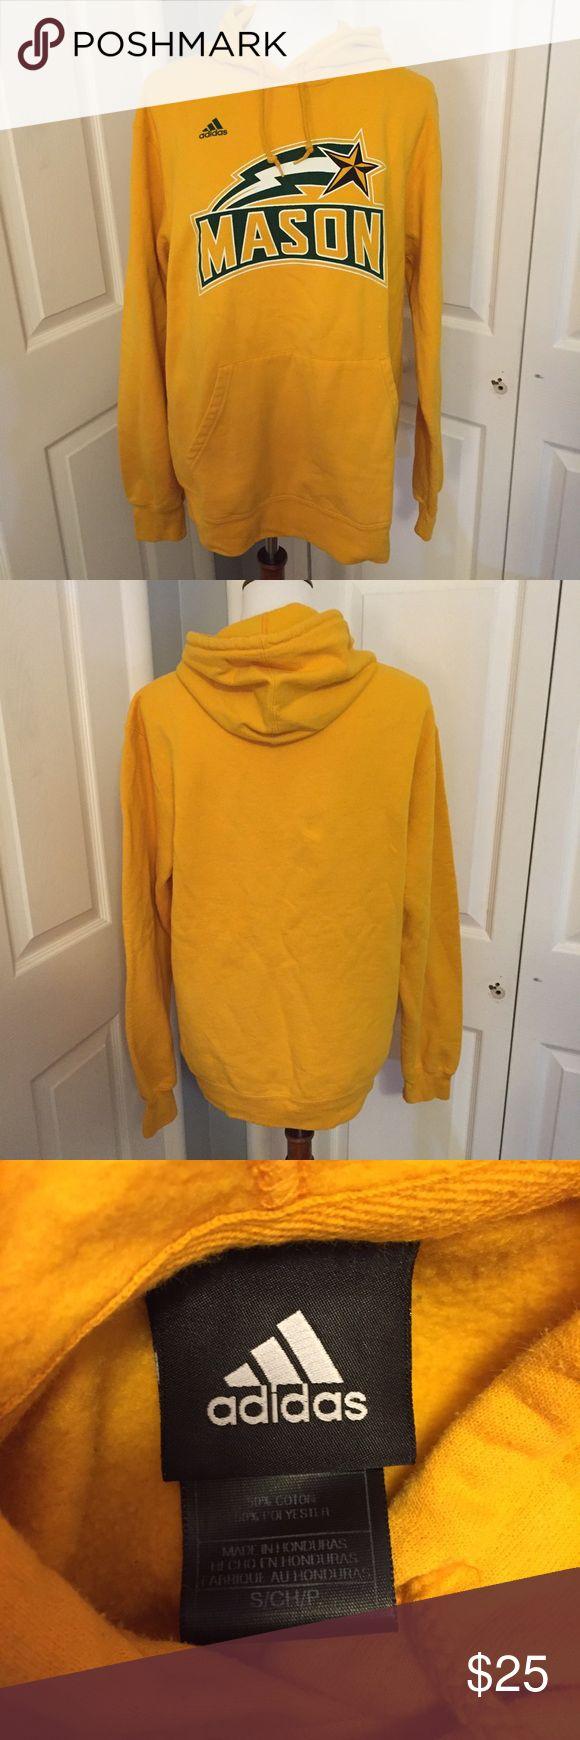 Color printing gmu - Adidas George Mason University Hoodie Size S Closet Clearout Adidas George Mason